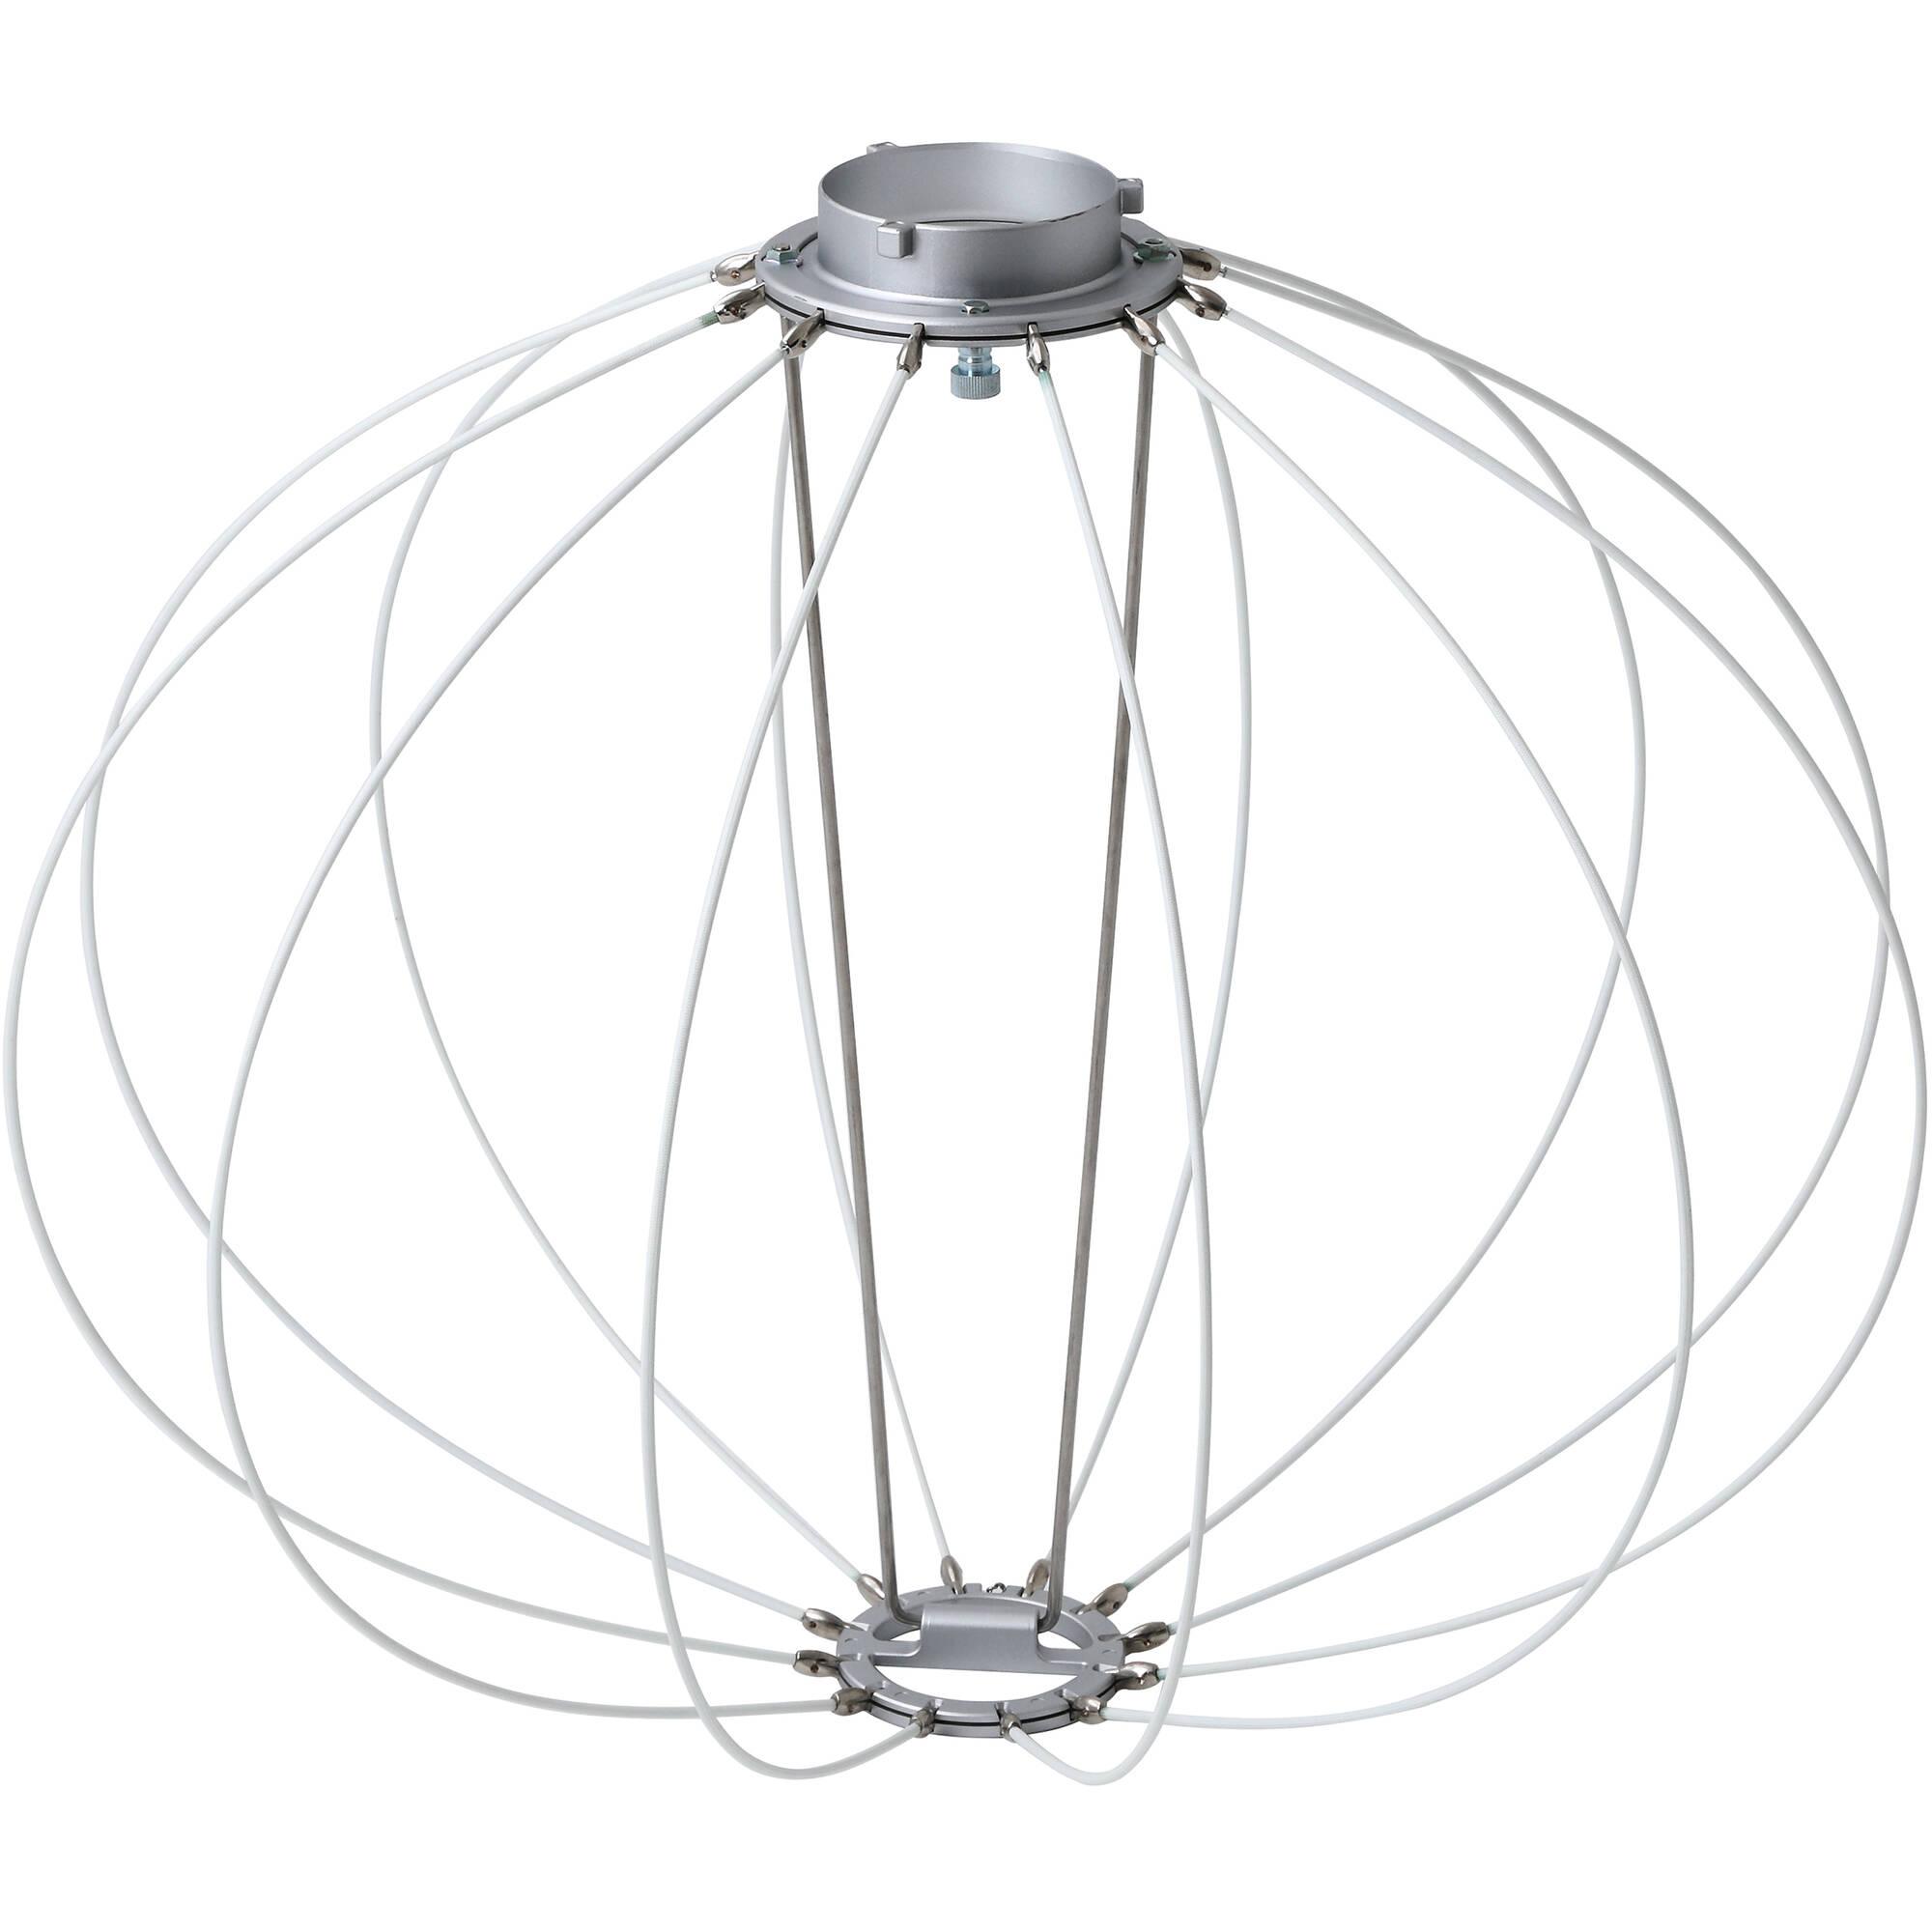 "Godox Collapsible Lantern Softbox (26.6"")"